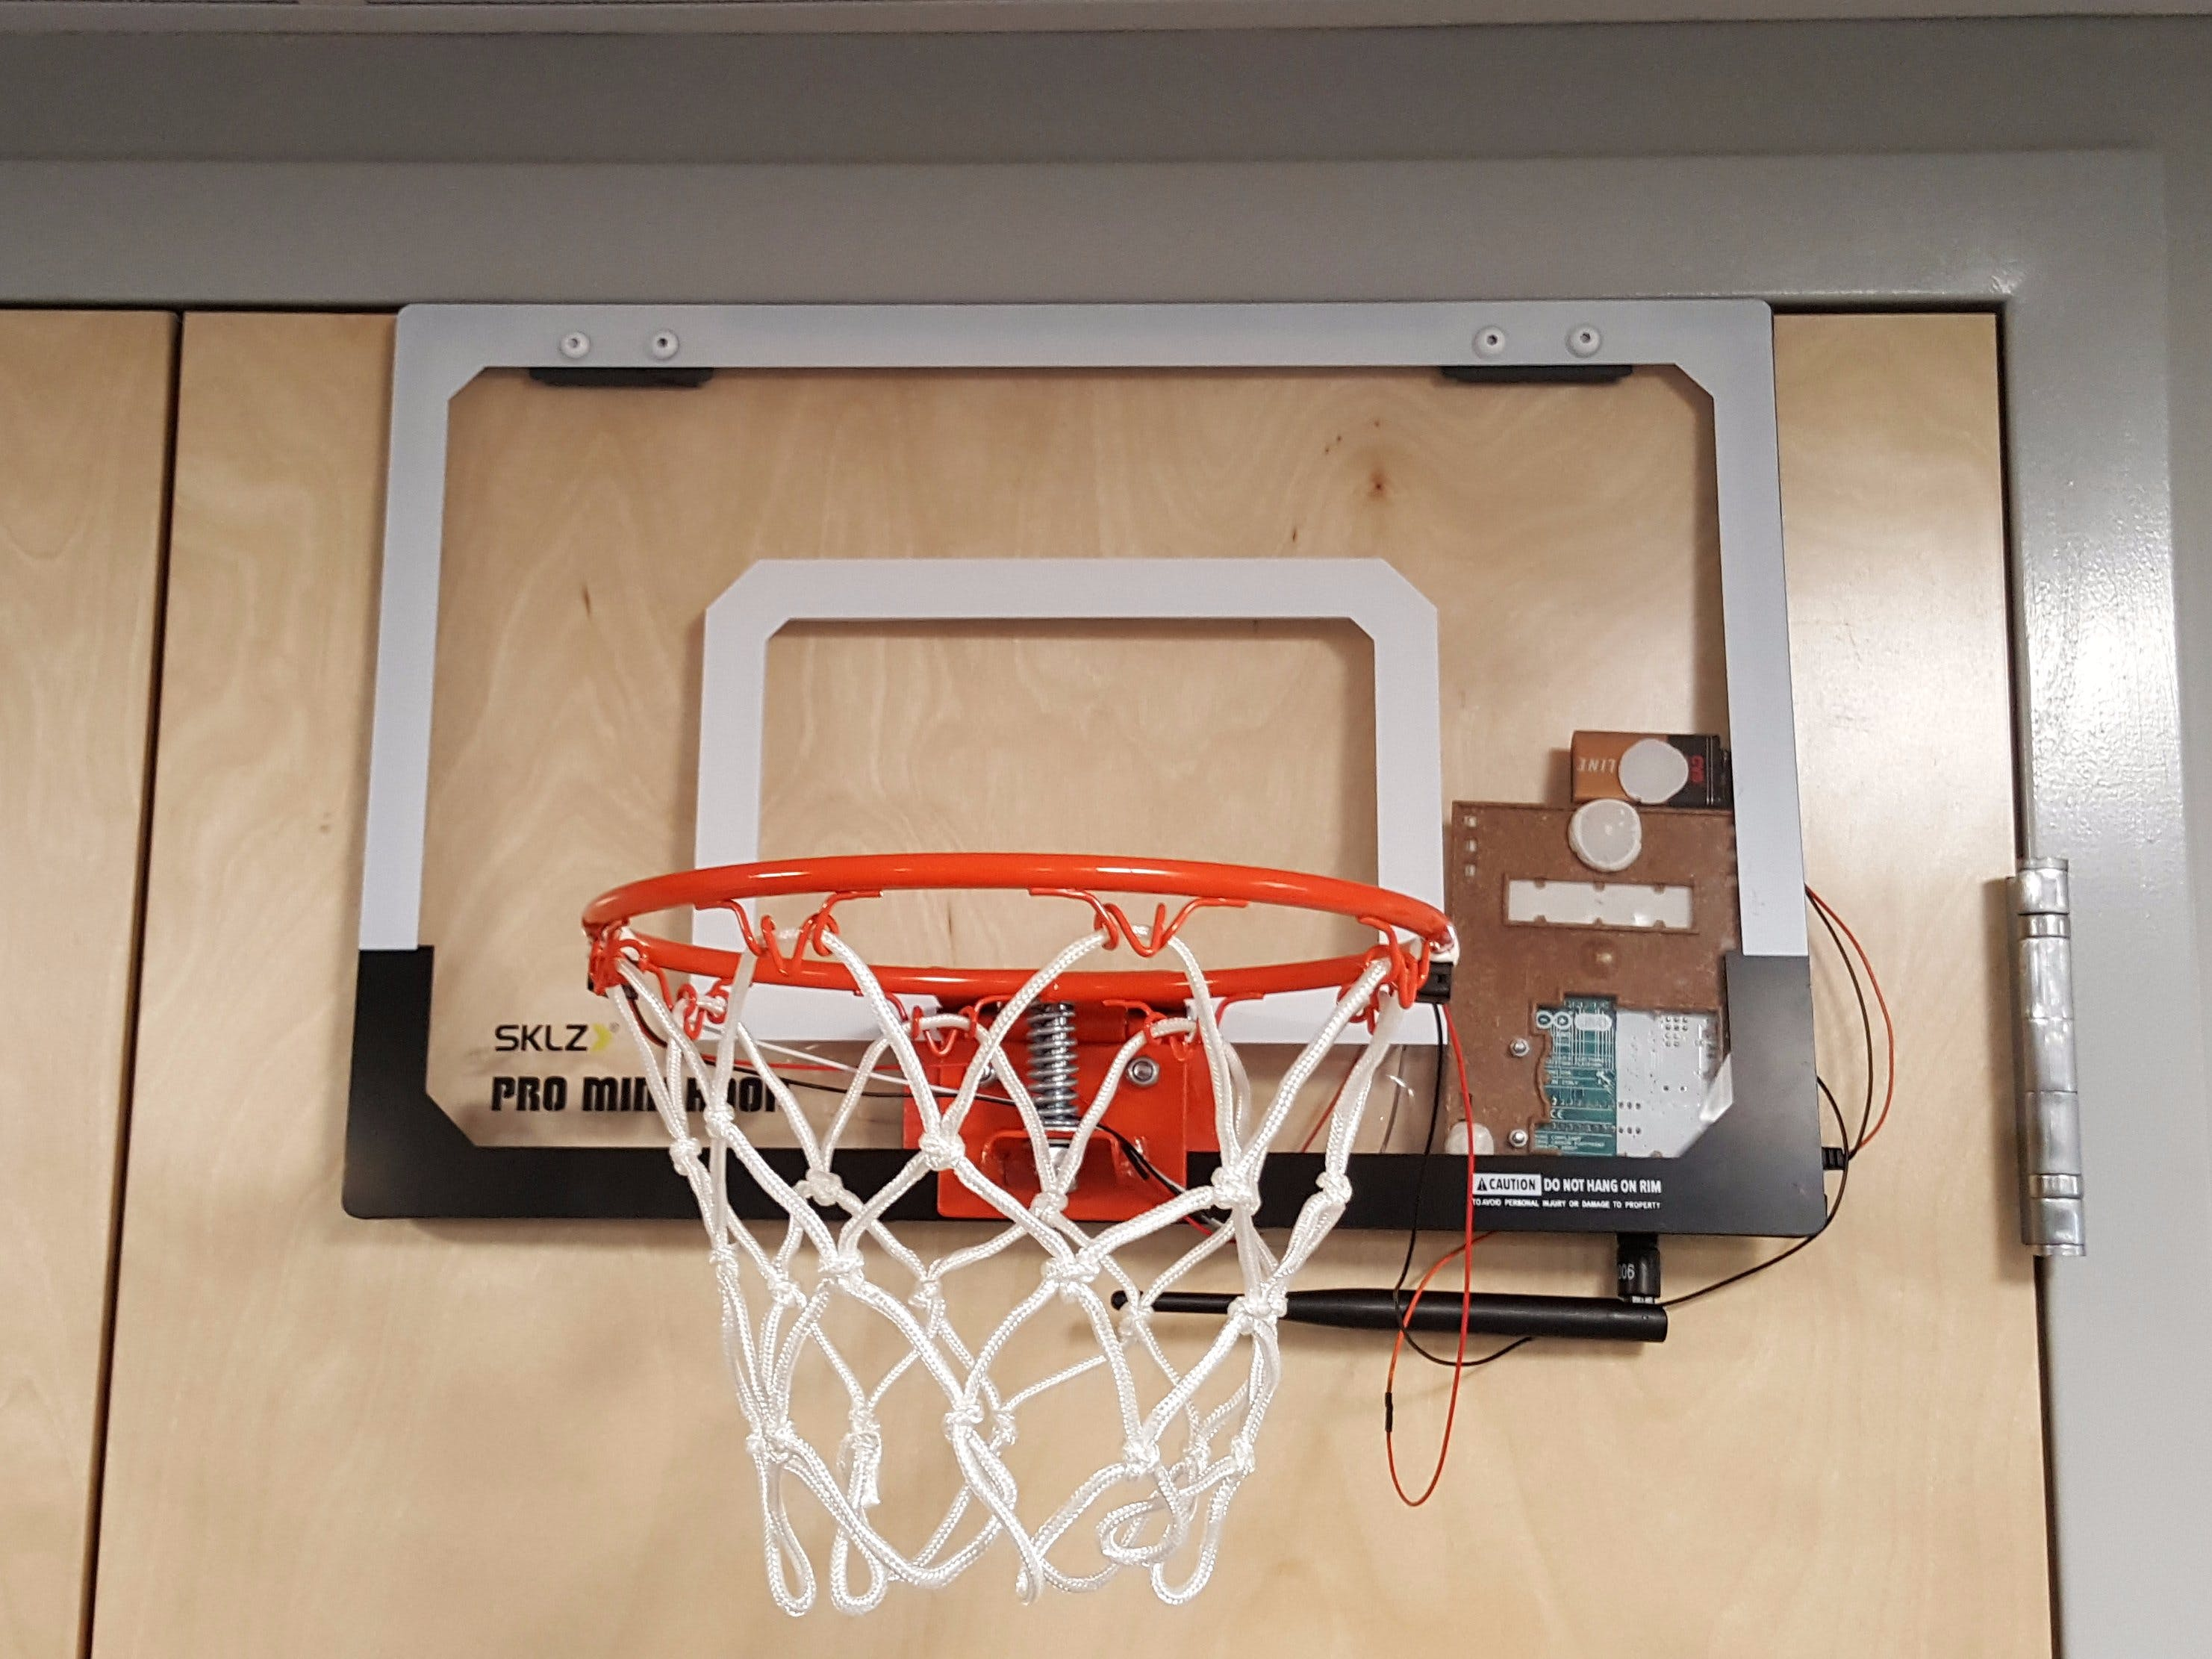 Sigfox-Connected Basketball Hoop